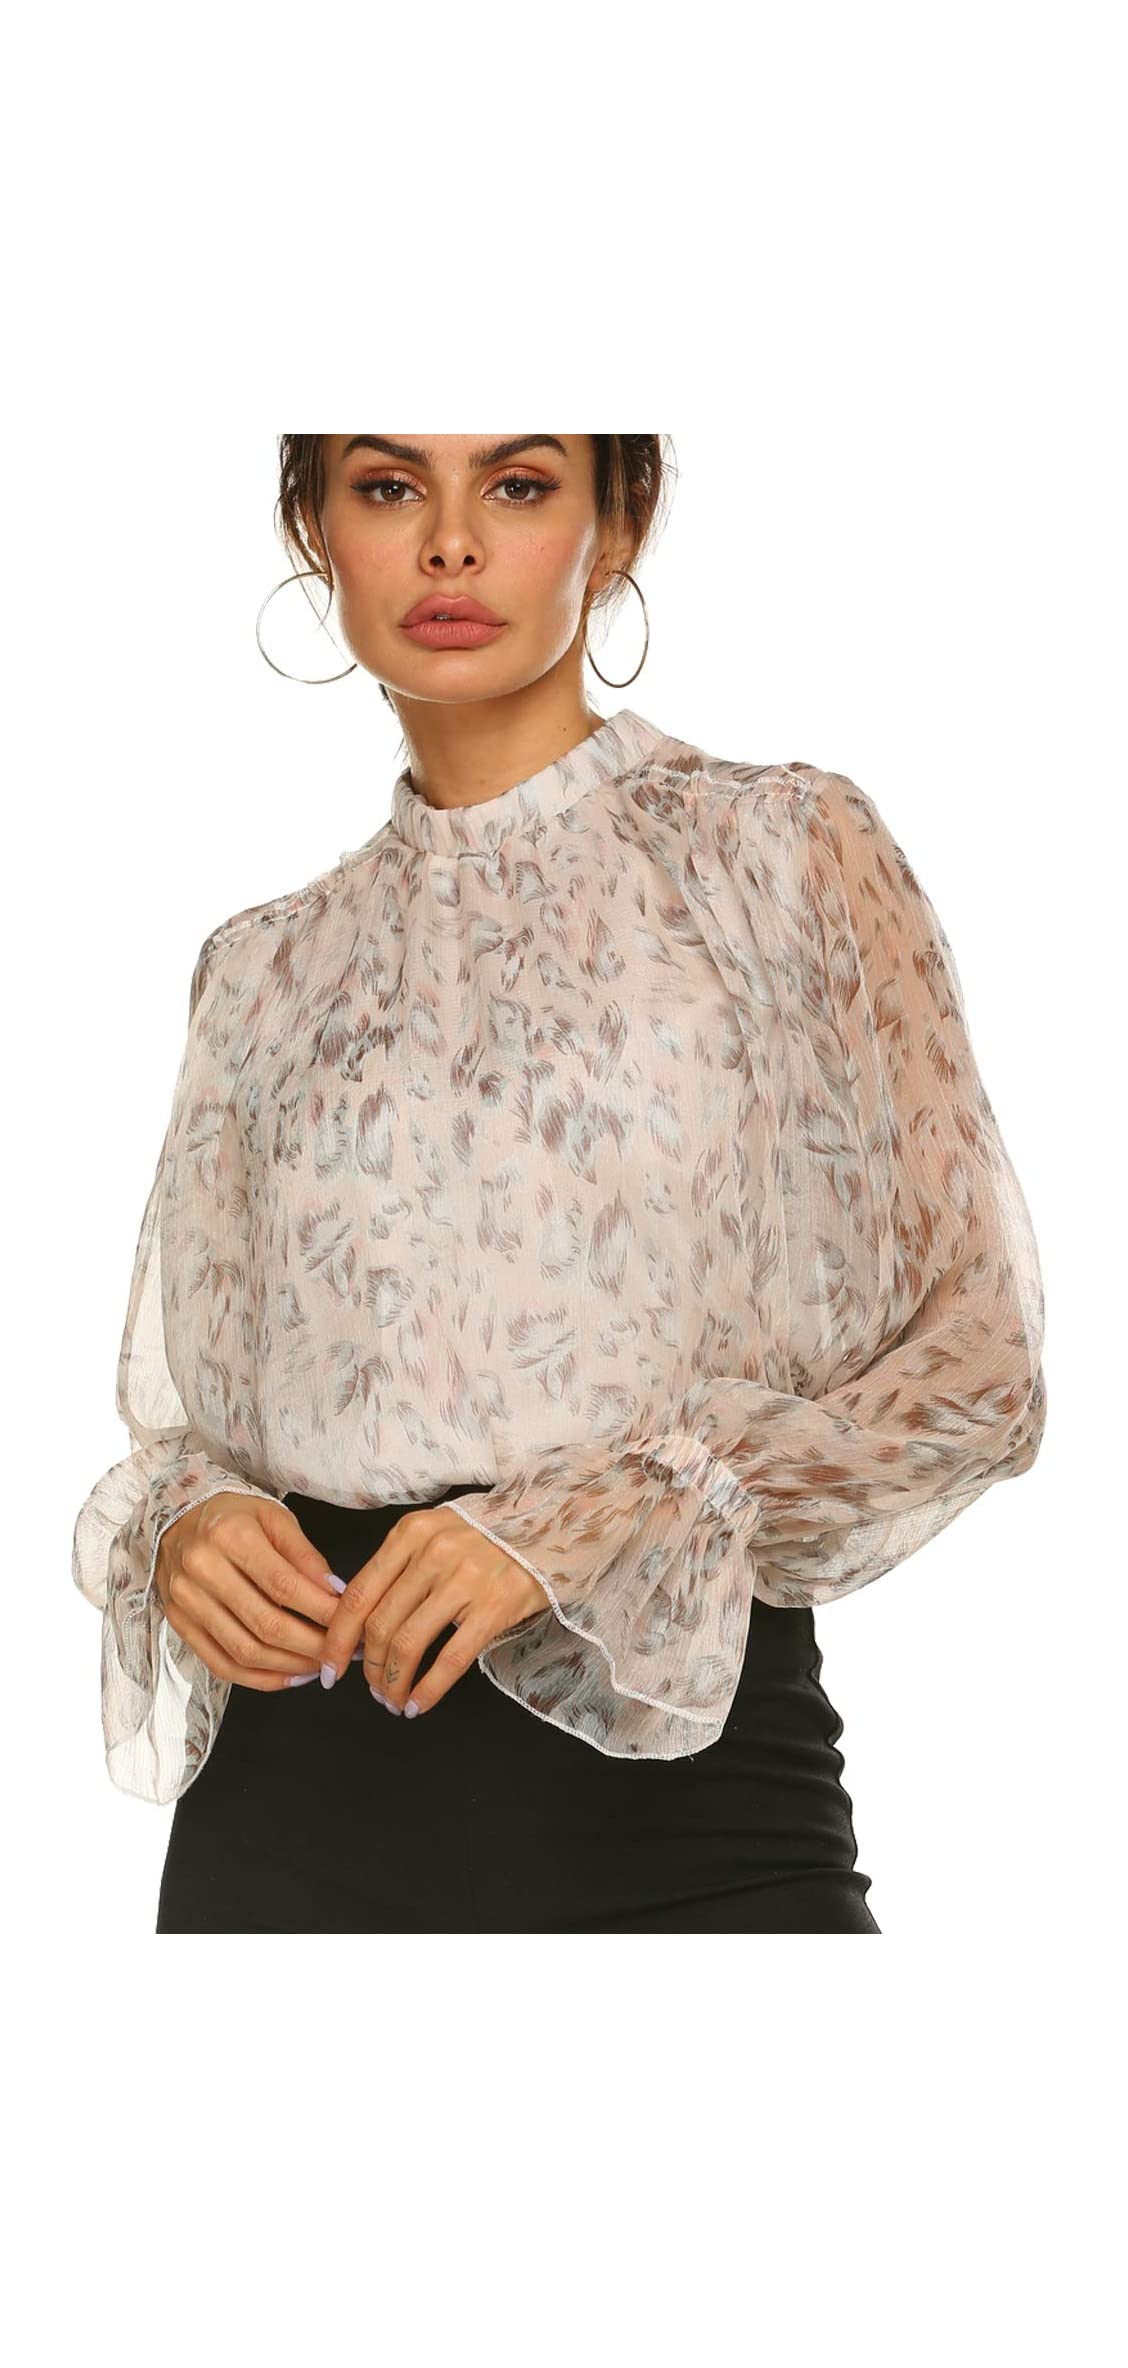 Women's Floral Ruffled Shoulder Chiffon Top Double Layers Blouse